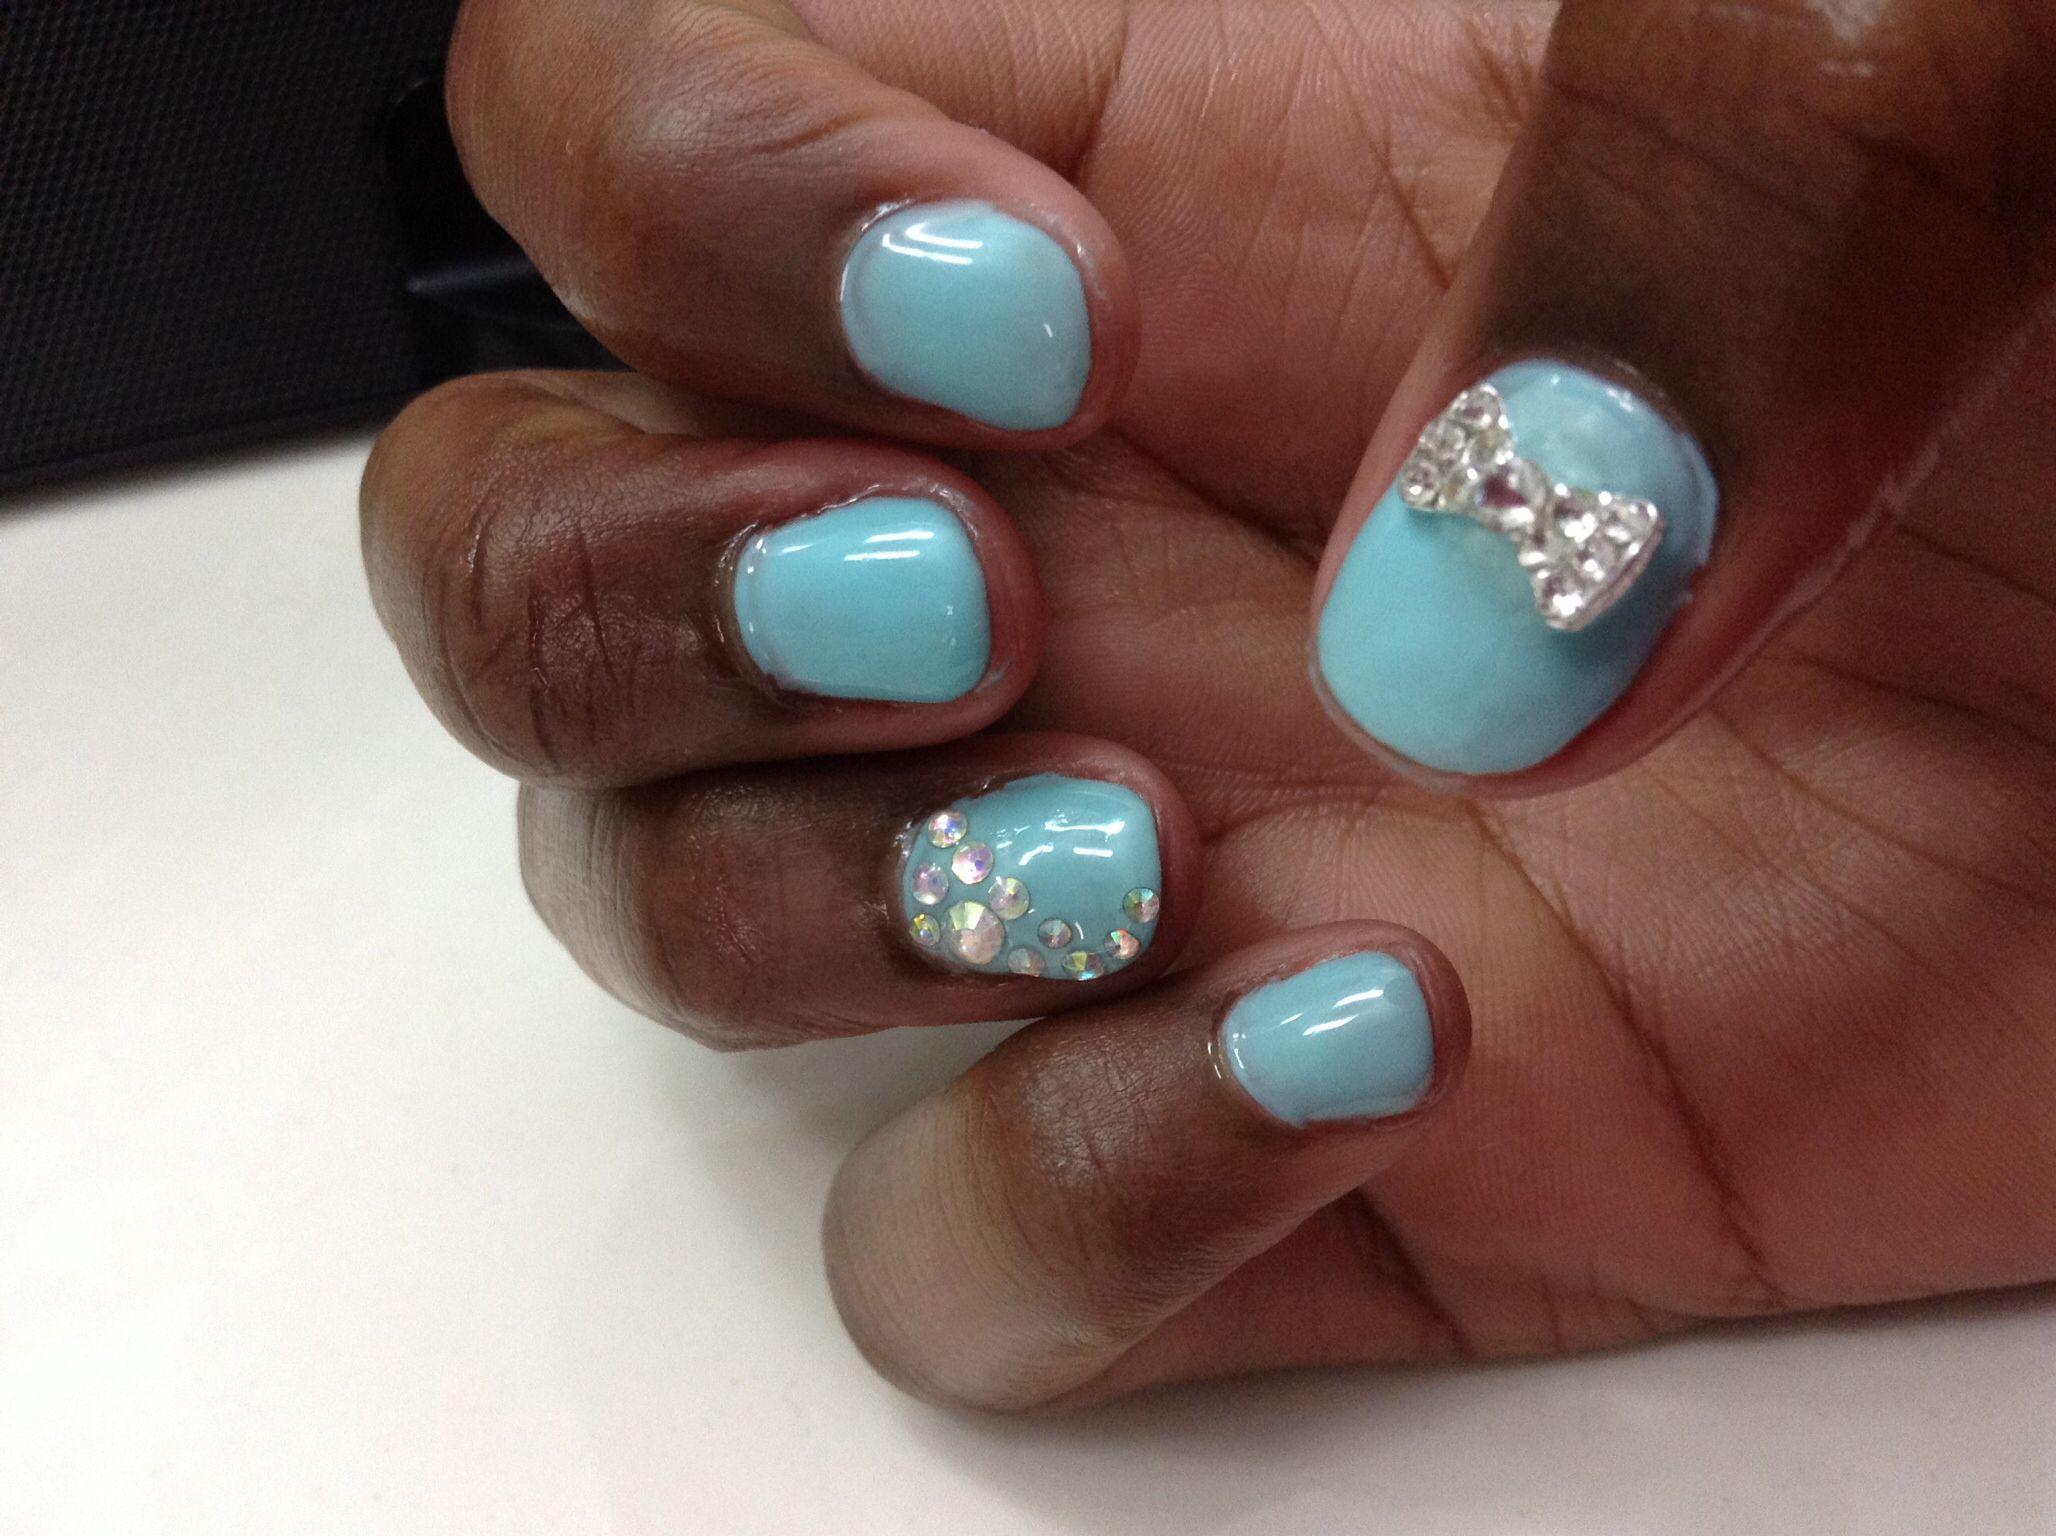 Hard rock nails @ the salon | Fantasy Nail Art! | Pinterest | Rock ...